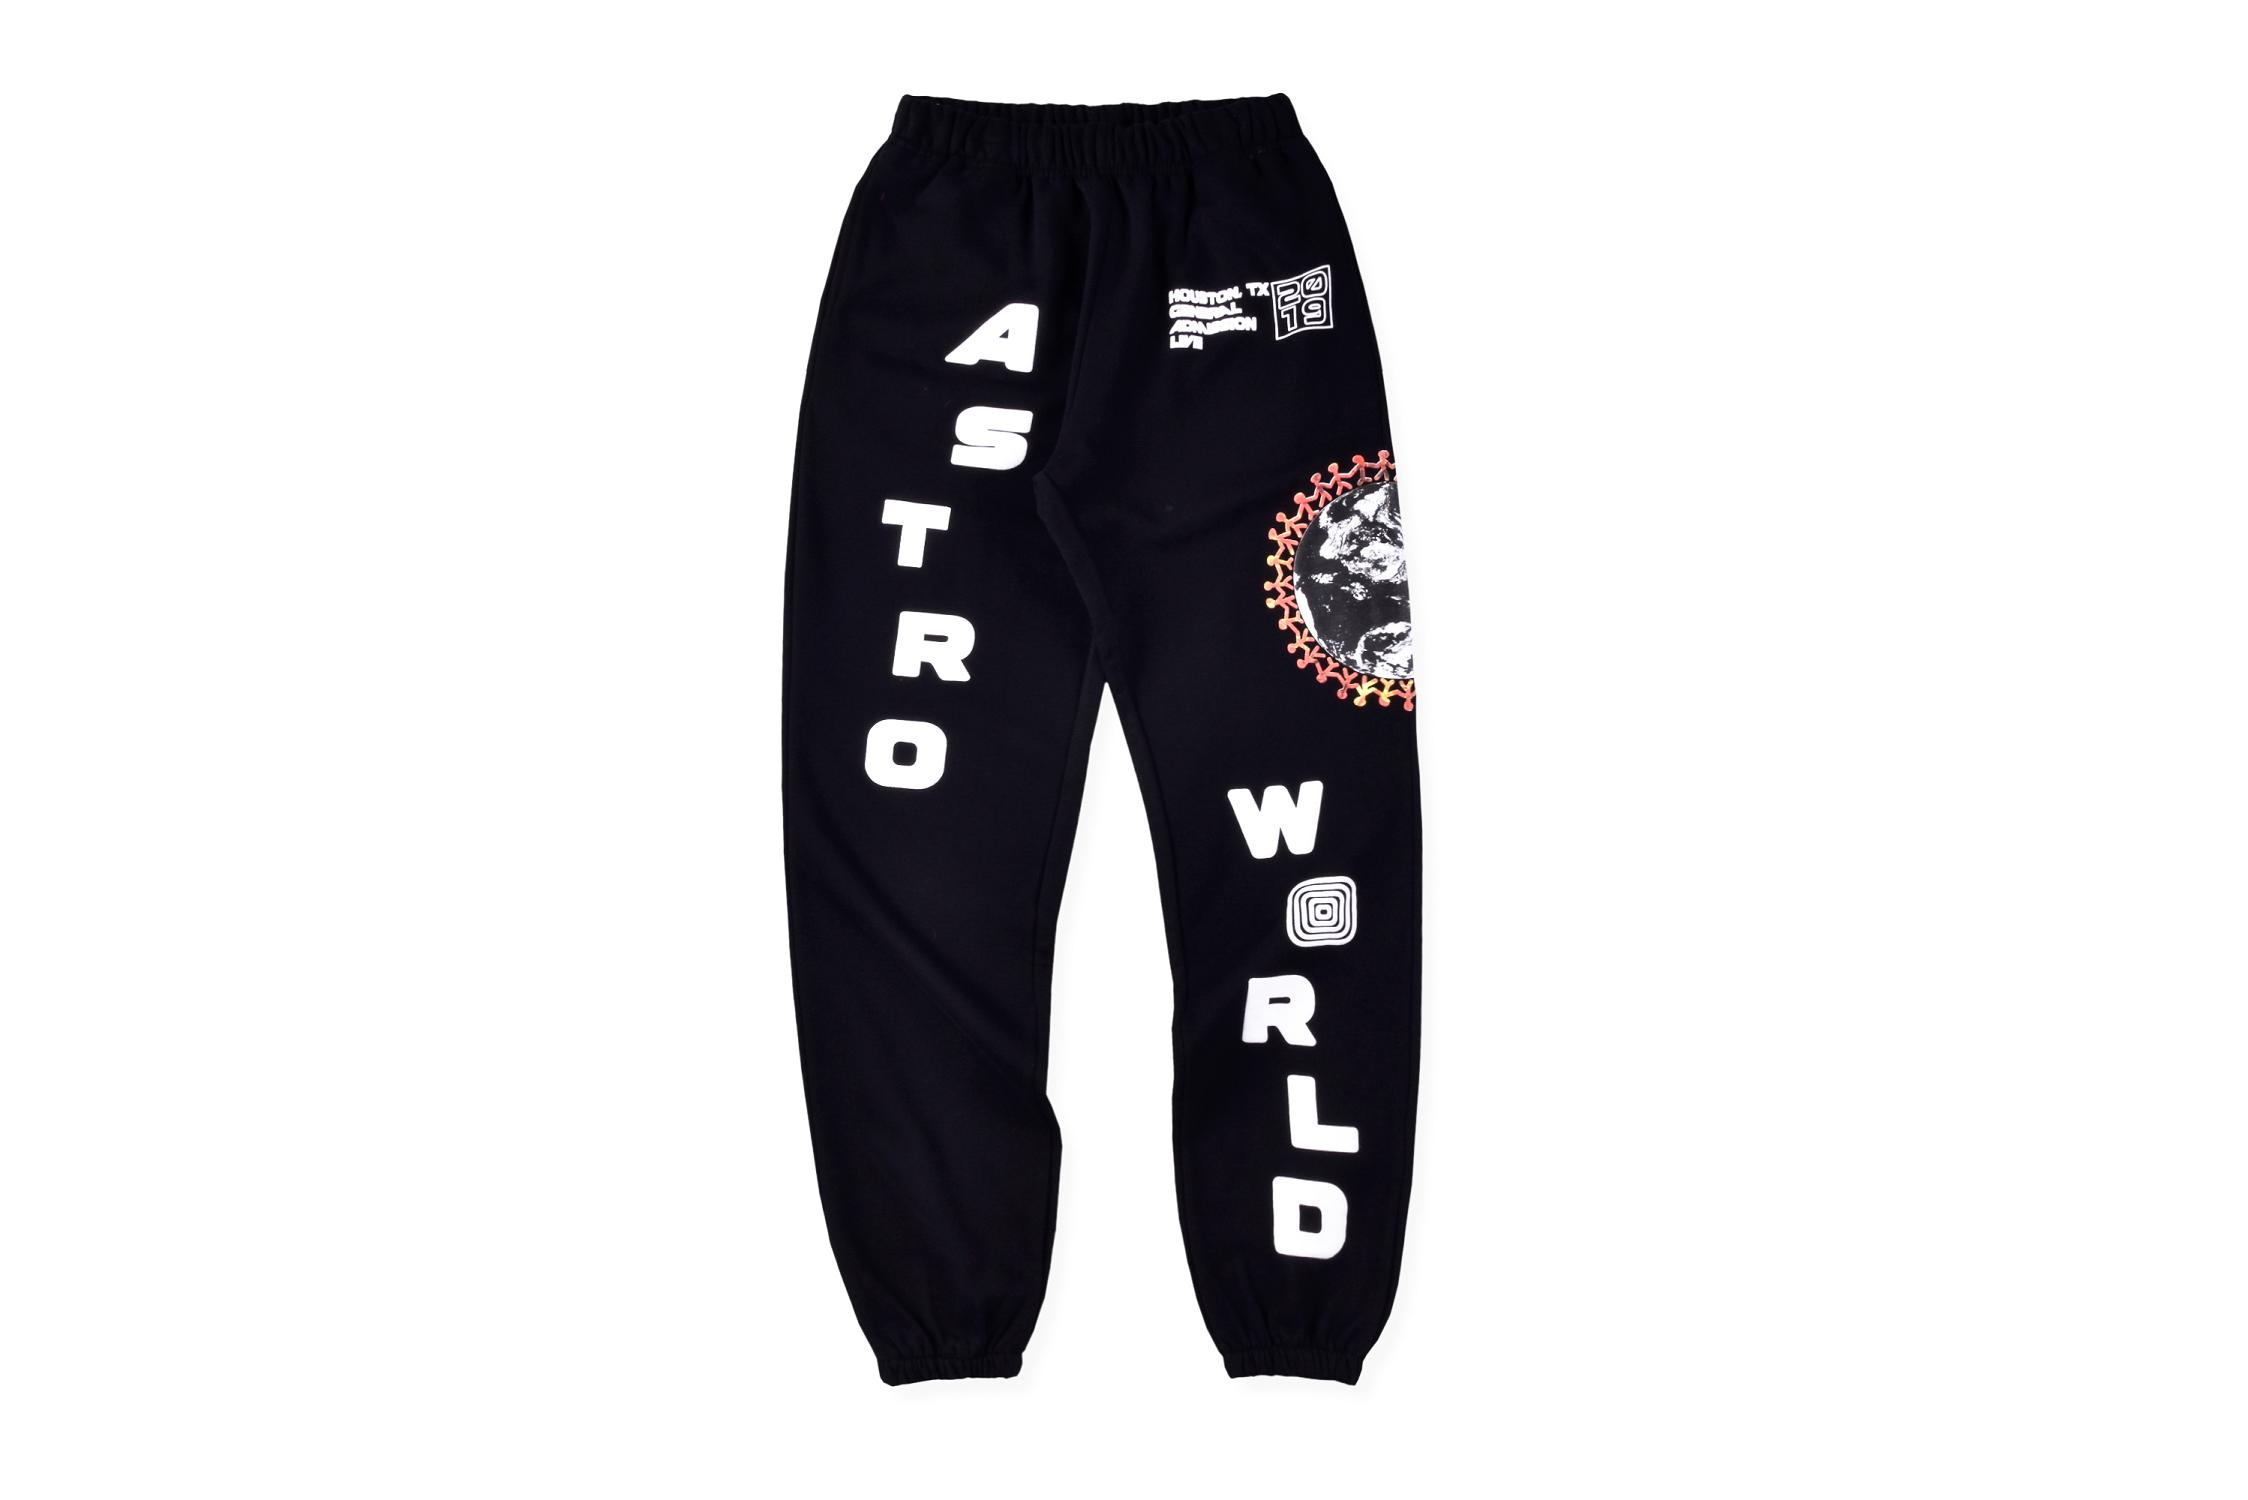 Travis Scott Astroworld Pants Men Cactus Jack Festival Globe Streetwear 1:1 High Quality Letters Joggers Travis Scott Sweatpants